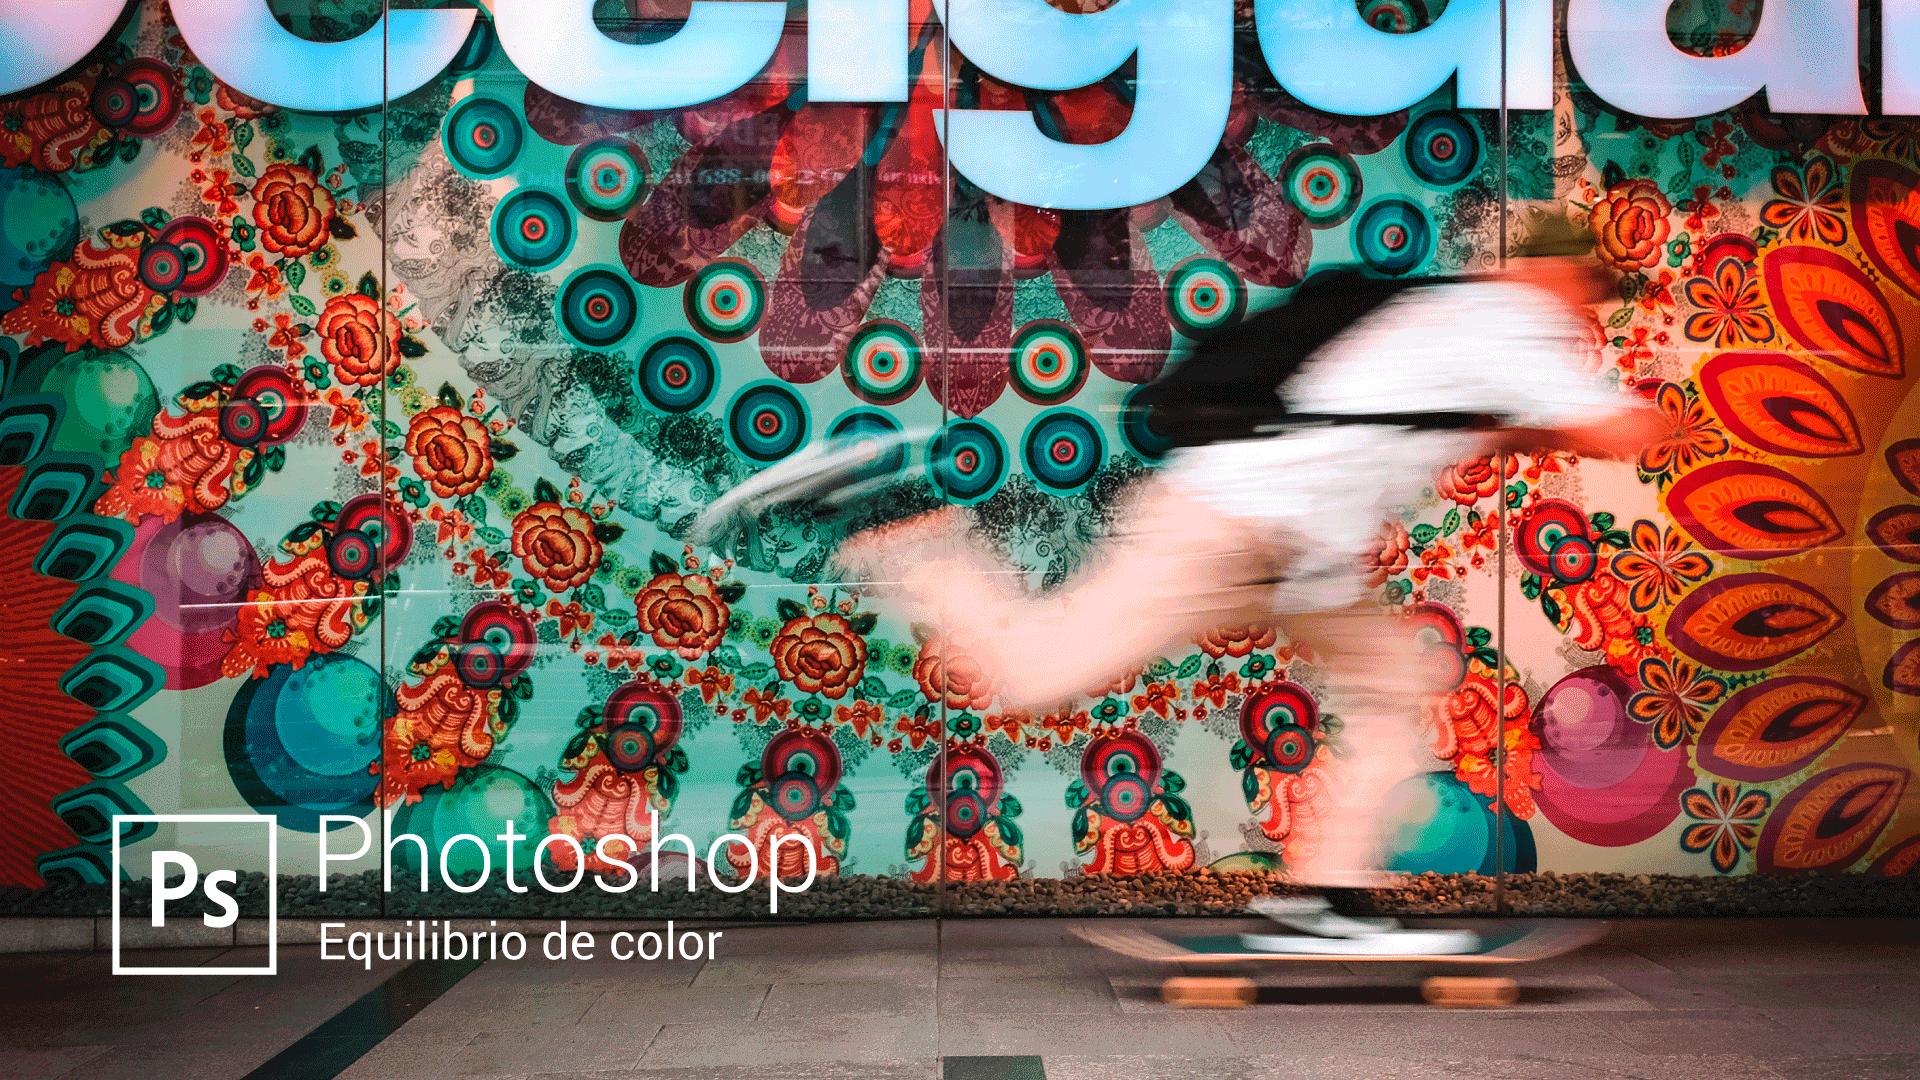 1001.graphics-photoshop-equilibrio-de-color_ch9kxv.png